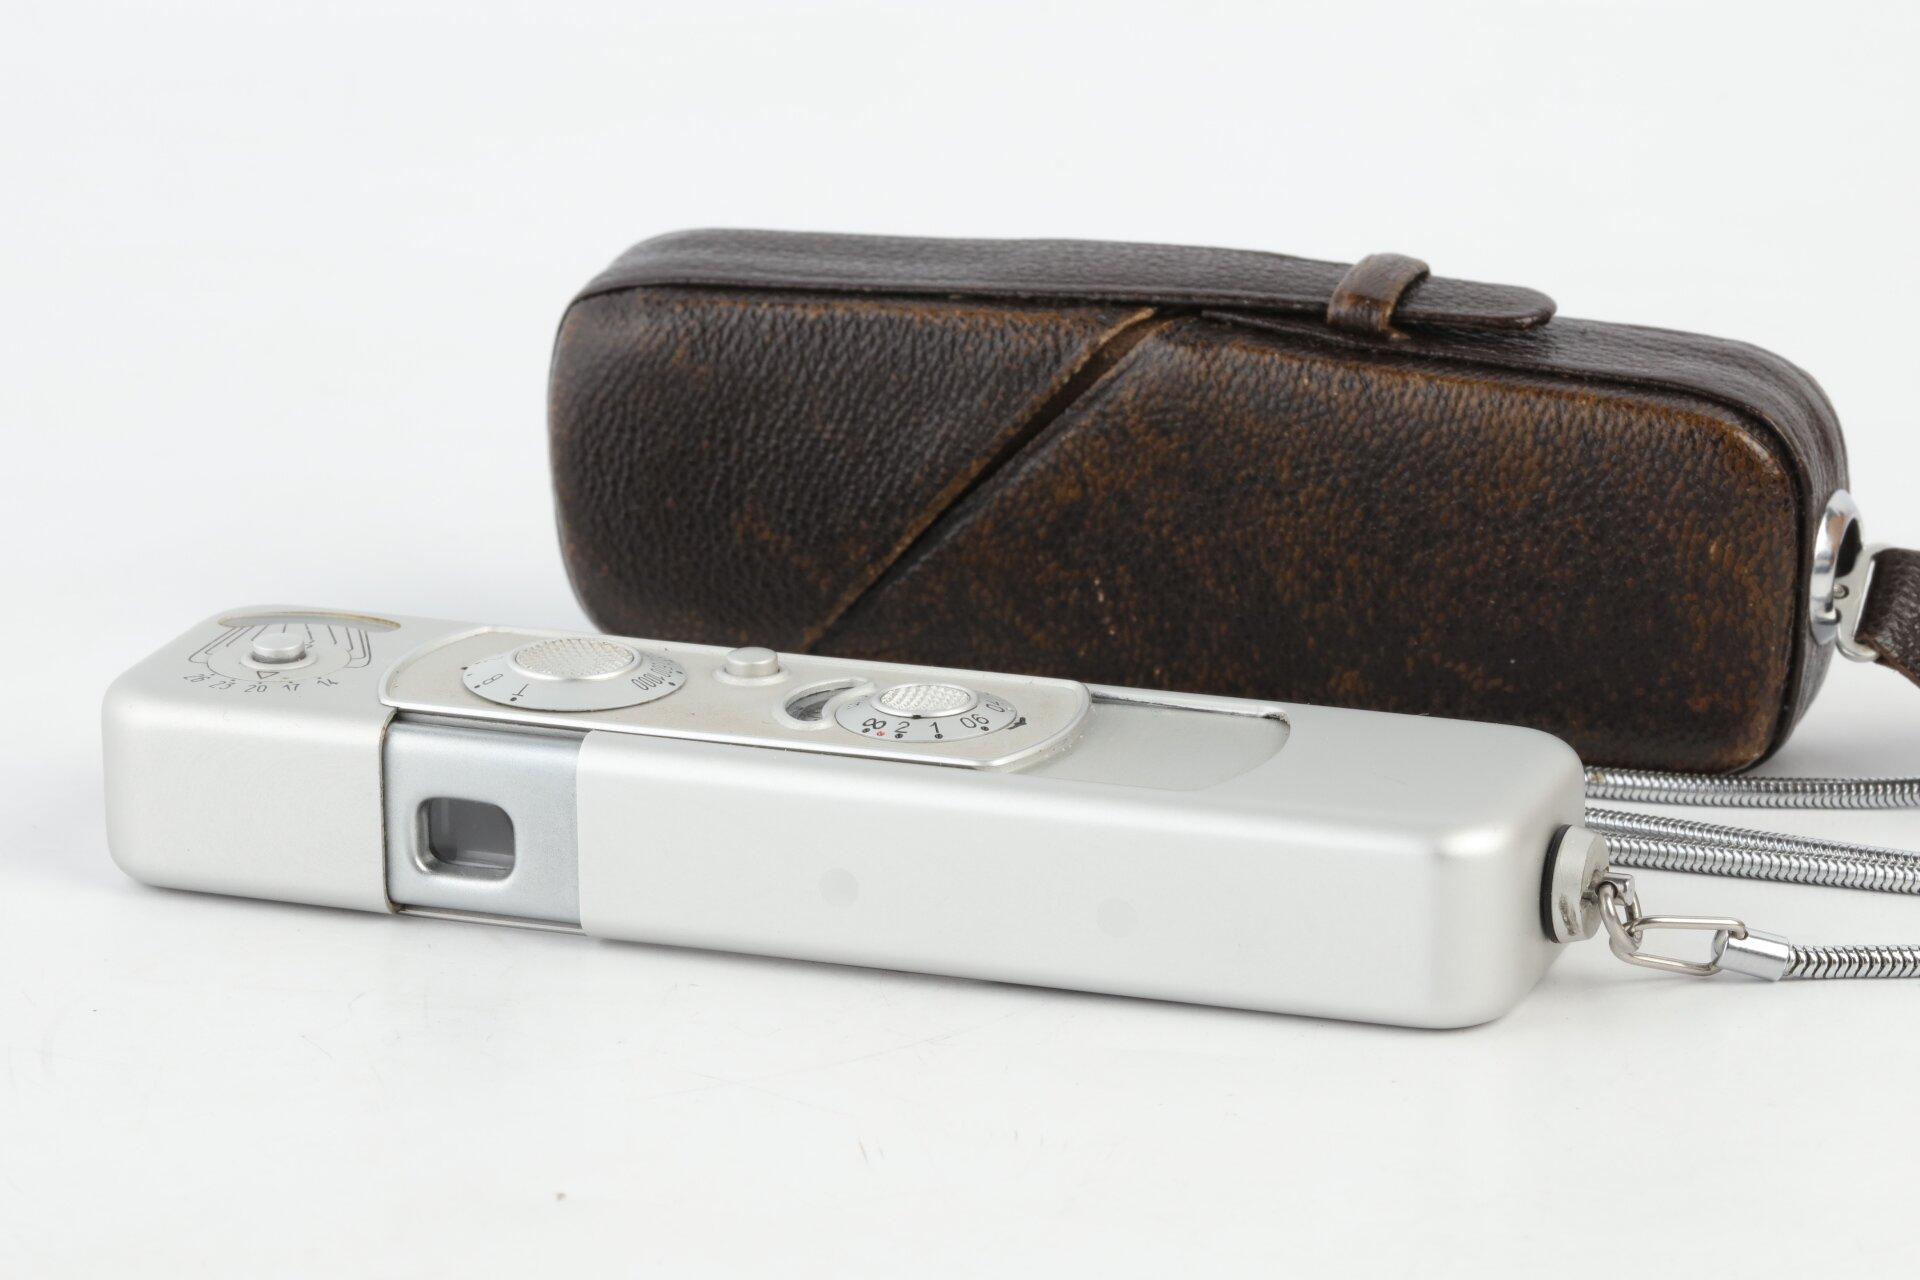 Minox C silber 8x11 Kleinstbildkamera